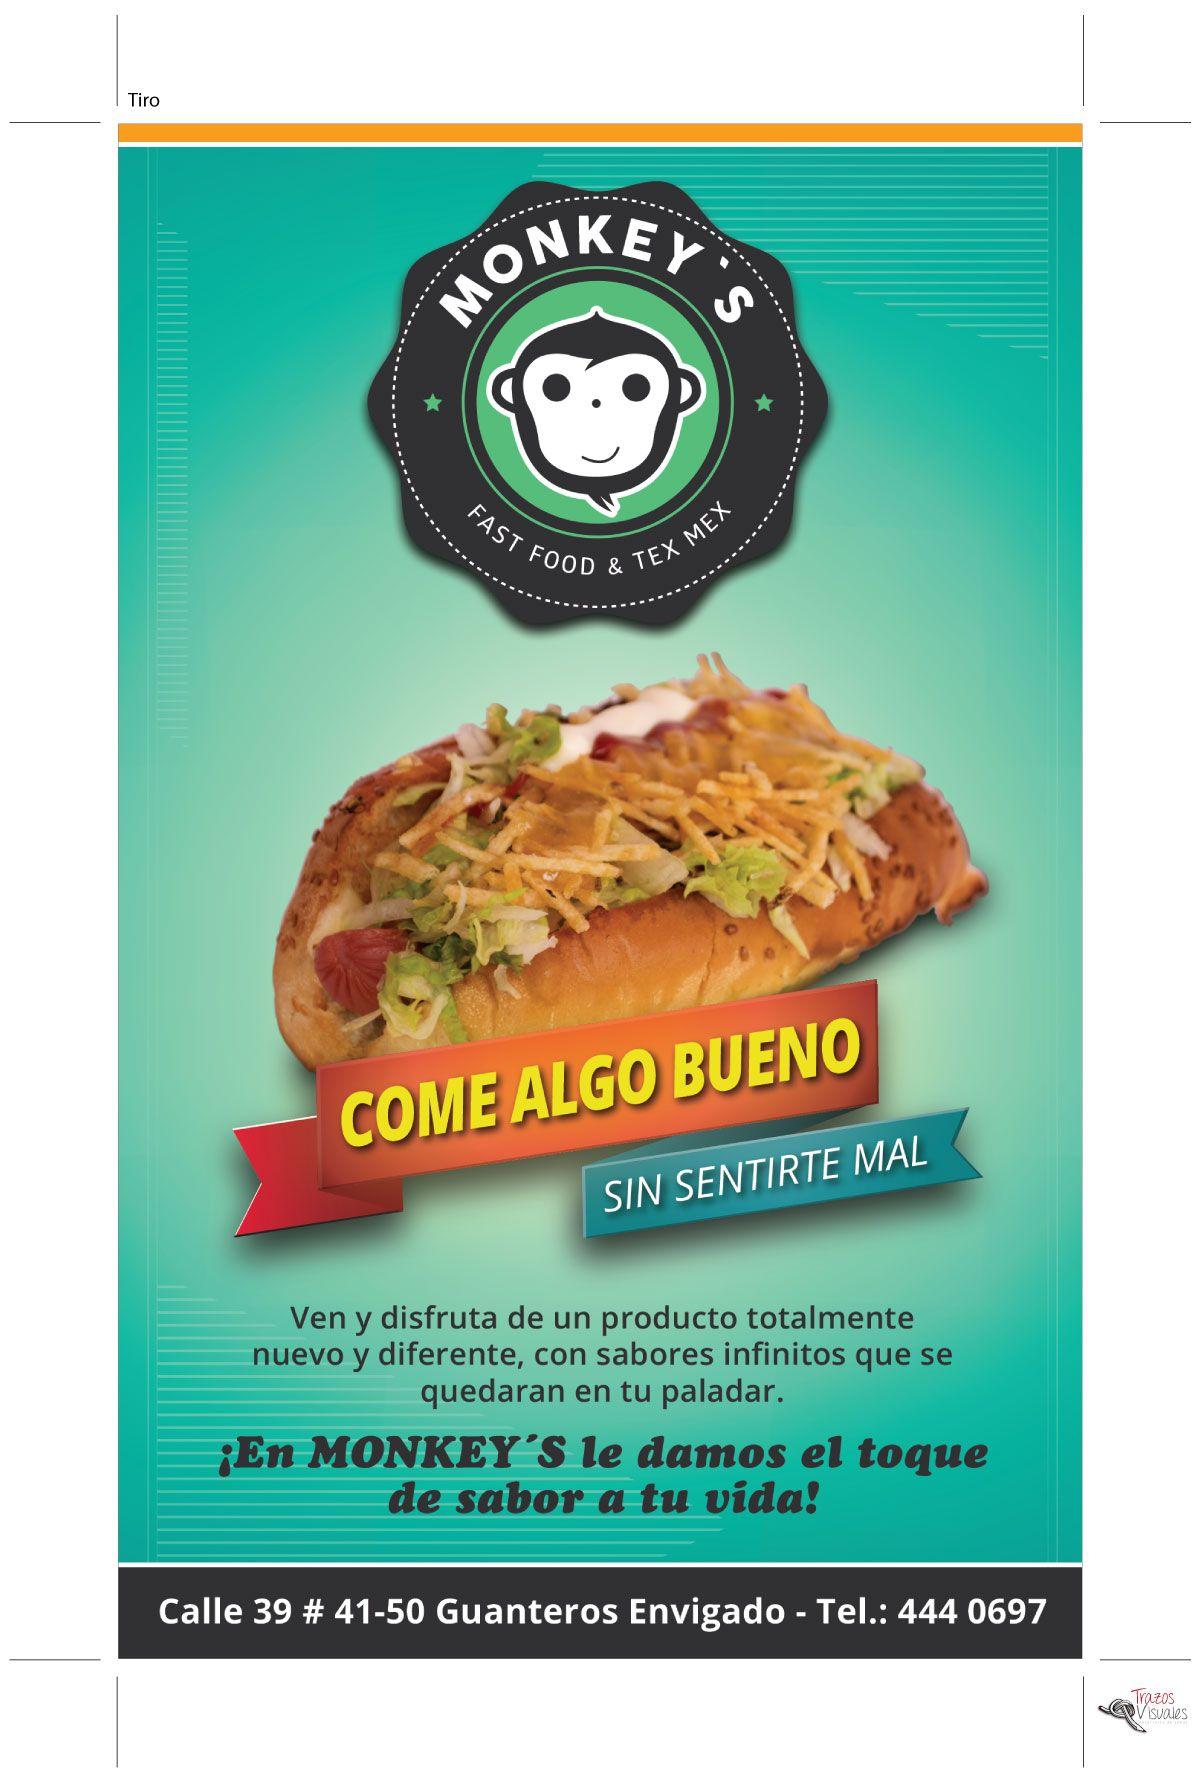 Pin by Trazos Visuales on Monkey s Identidad Corporativa